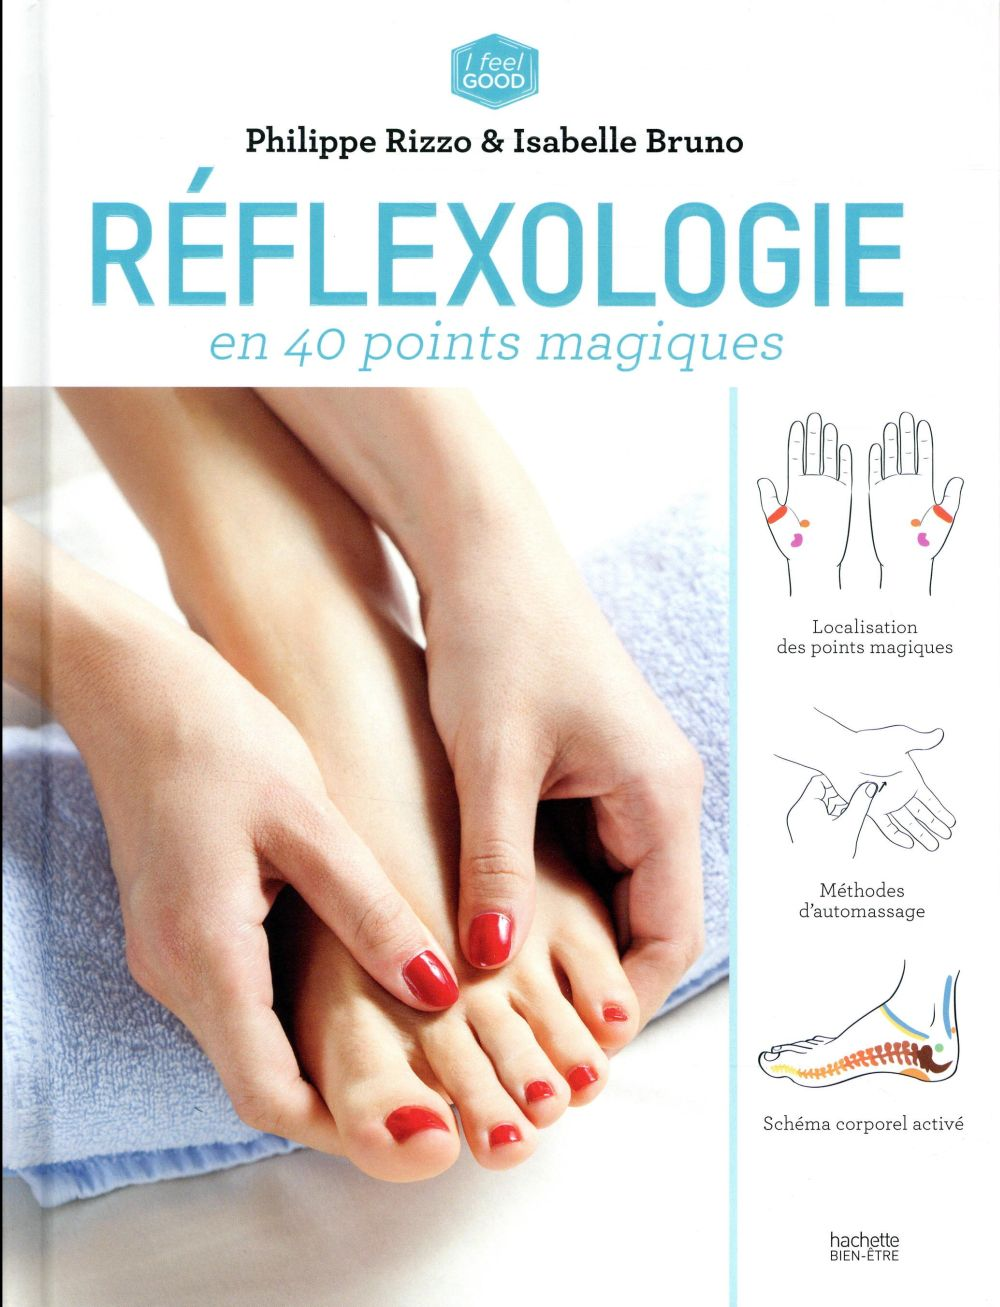 REFLEXOLOGIE ANTI-STRESS EN 40 POINTS MAGIQUES RIZZO-P+BRUNO-I HACHETTE